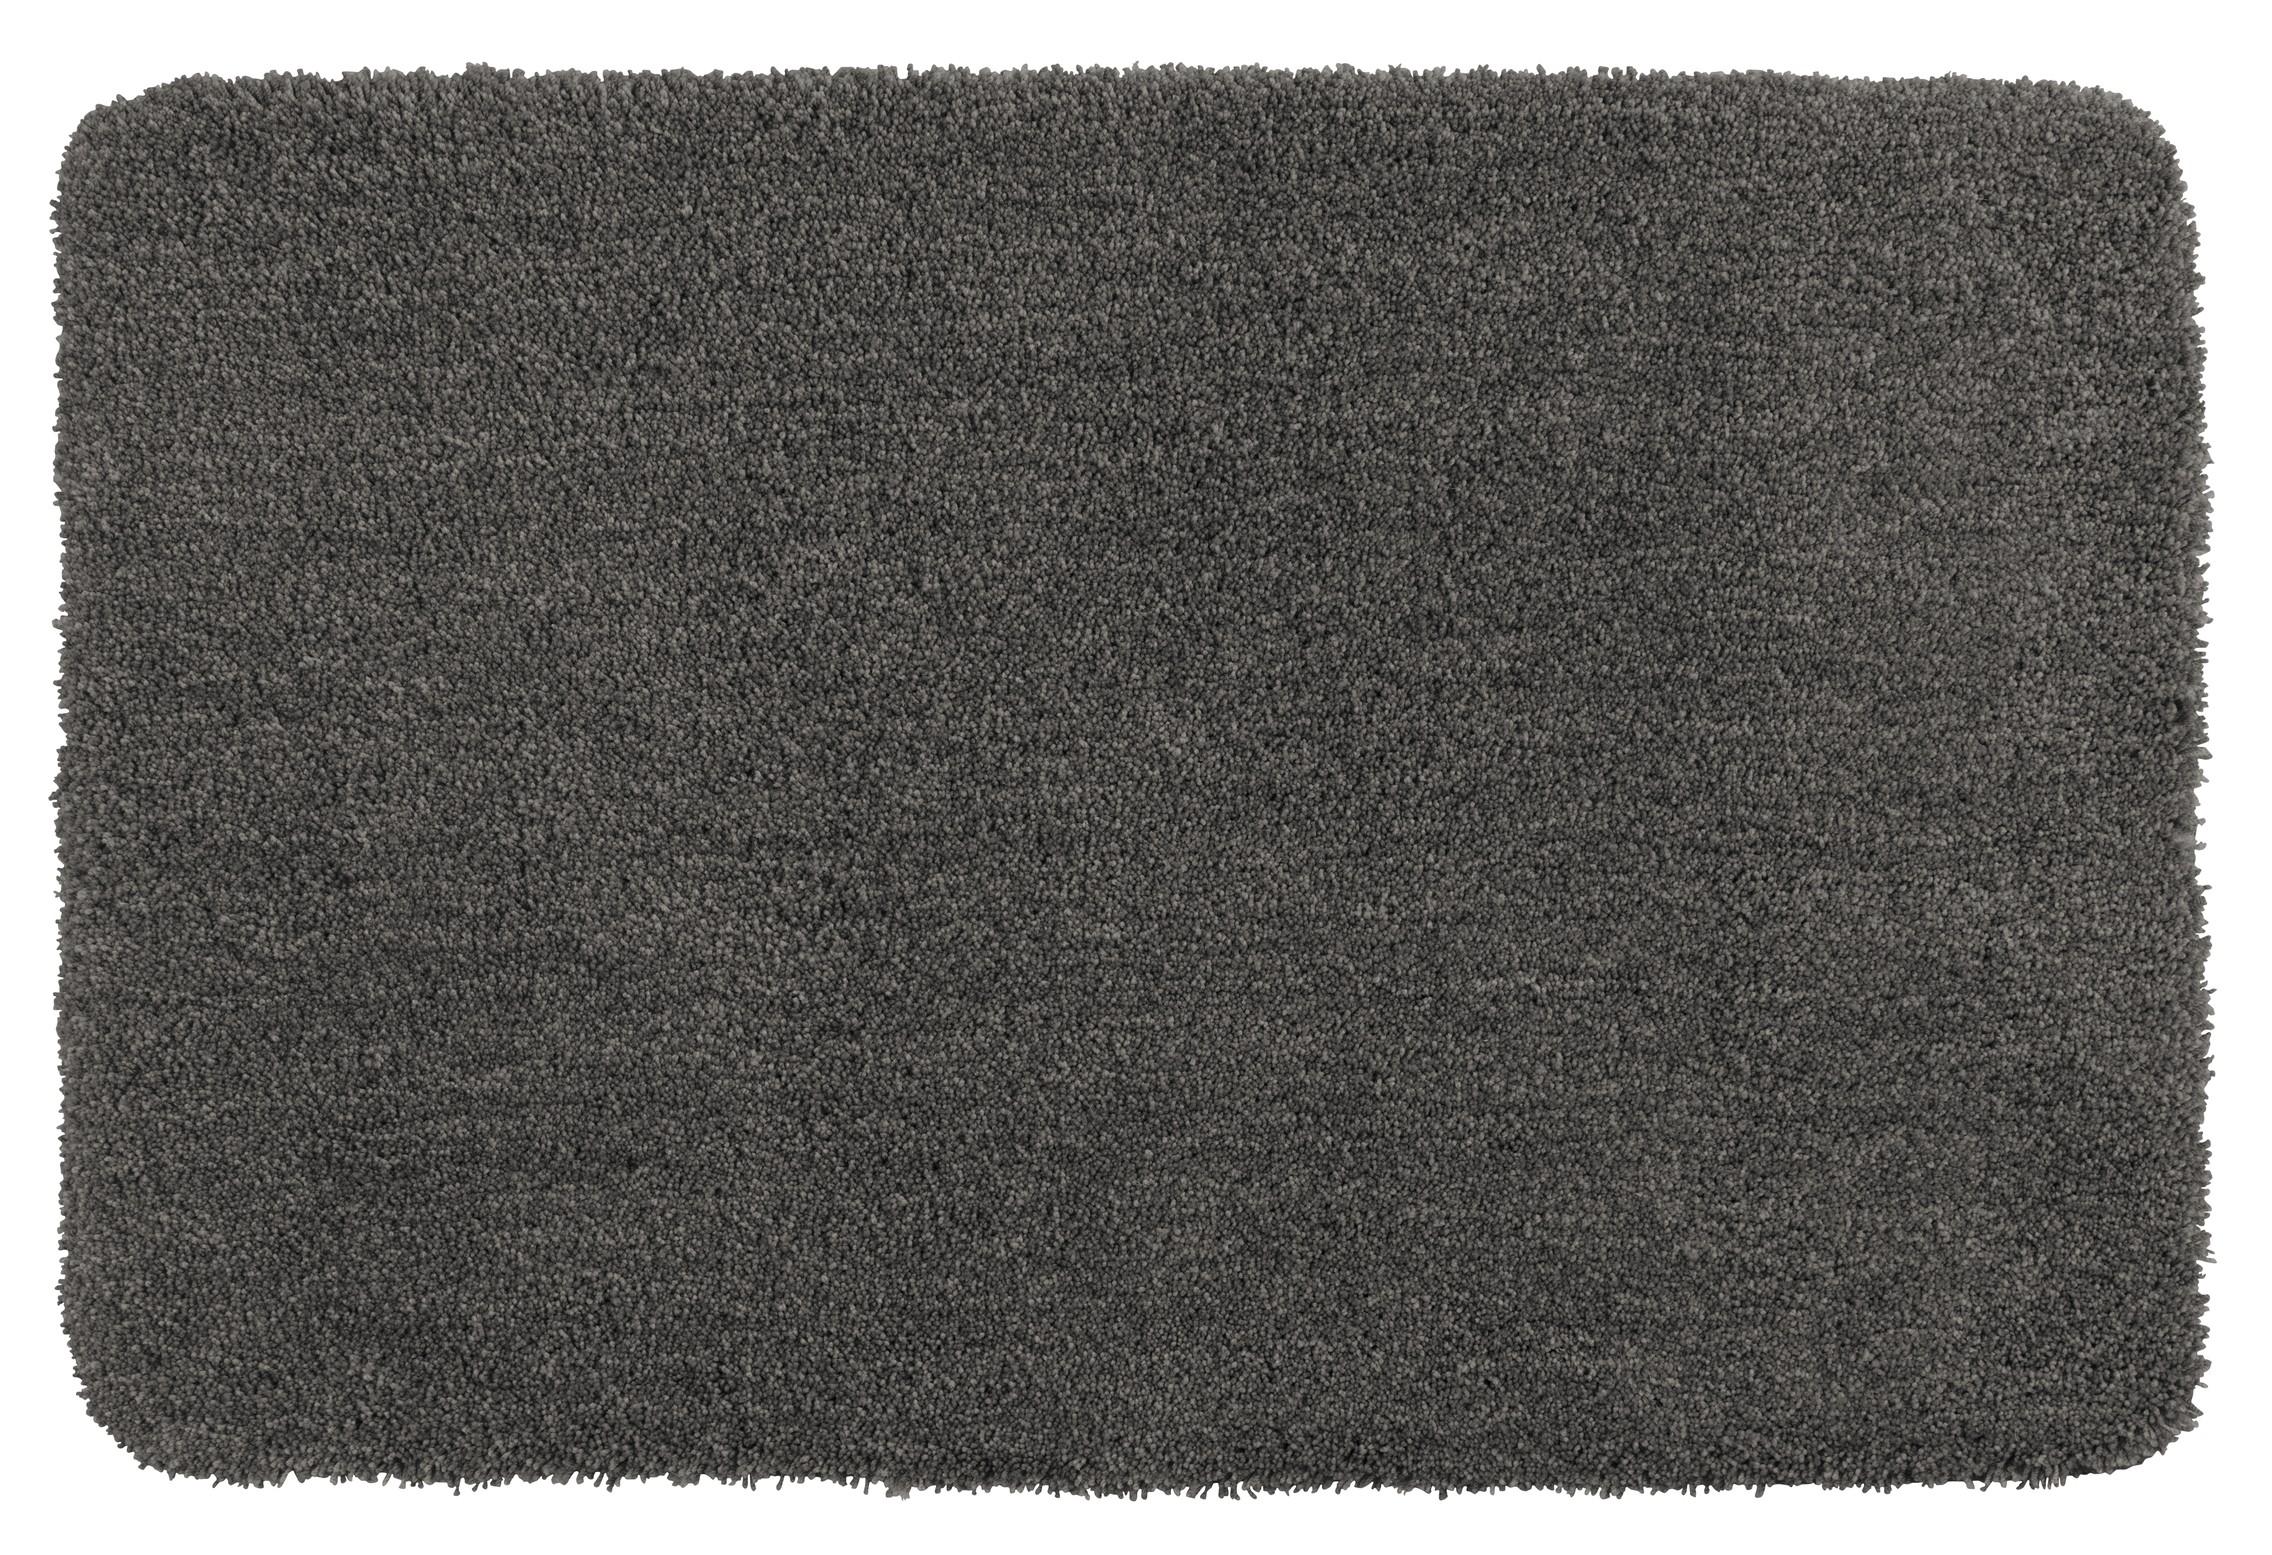 Wenko Badteppich Belize Mouse Grey, 70 x 120 cm, Mikrofaser